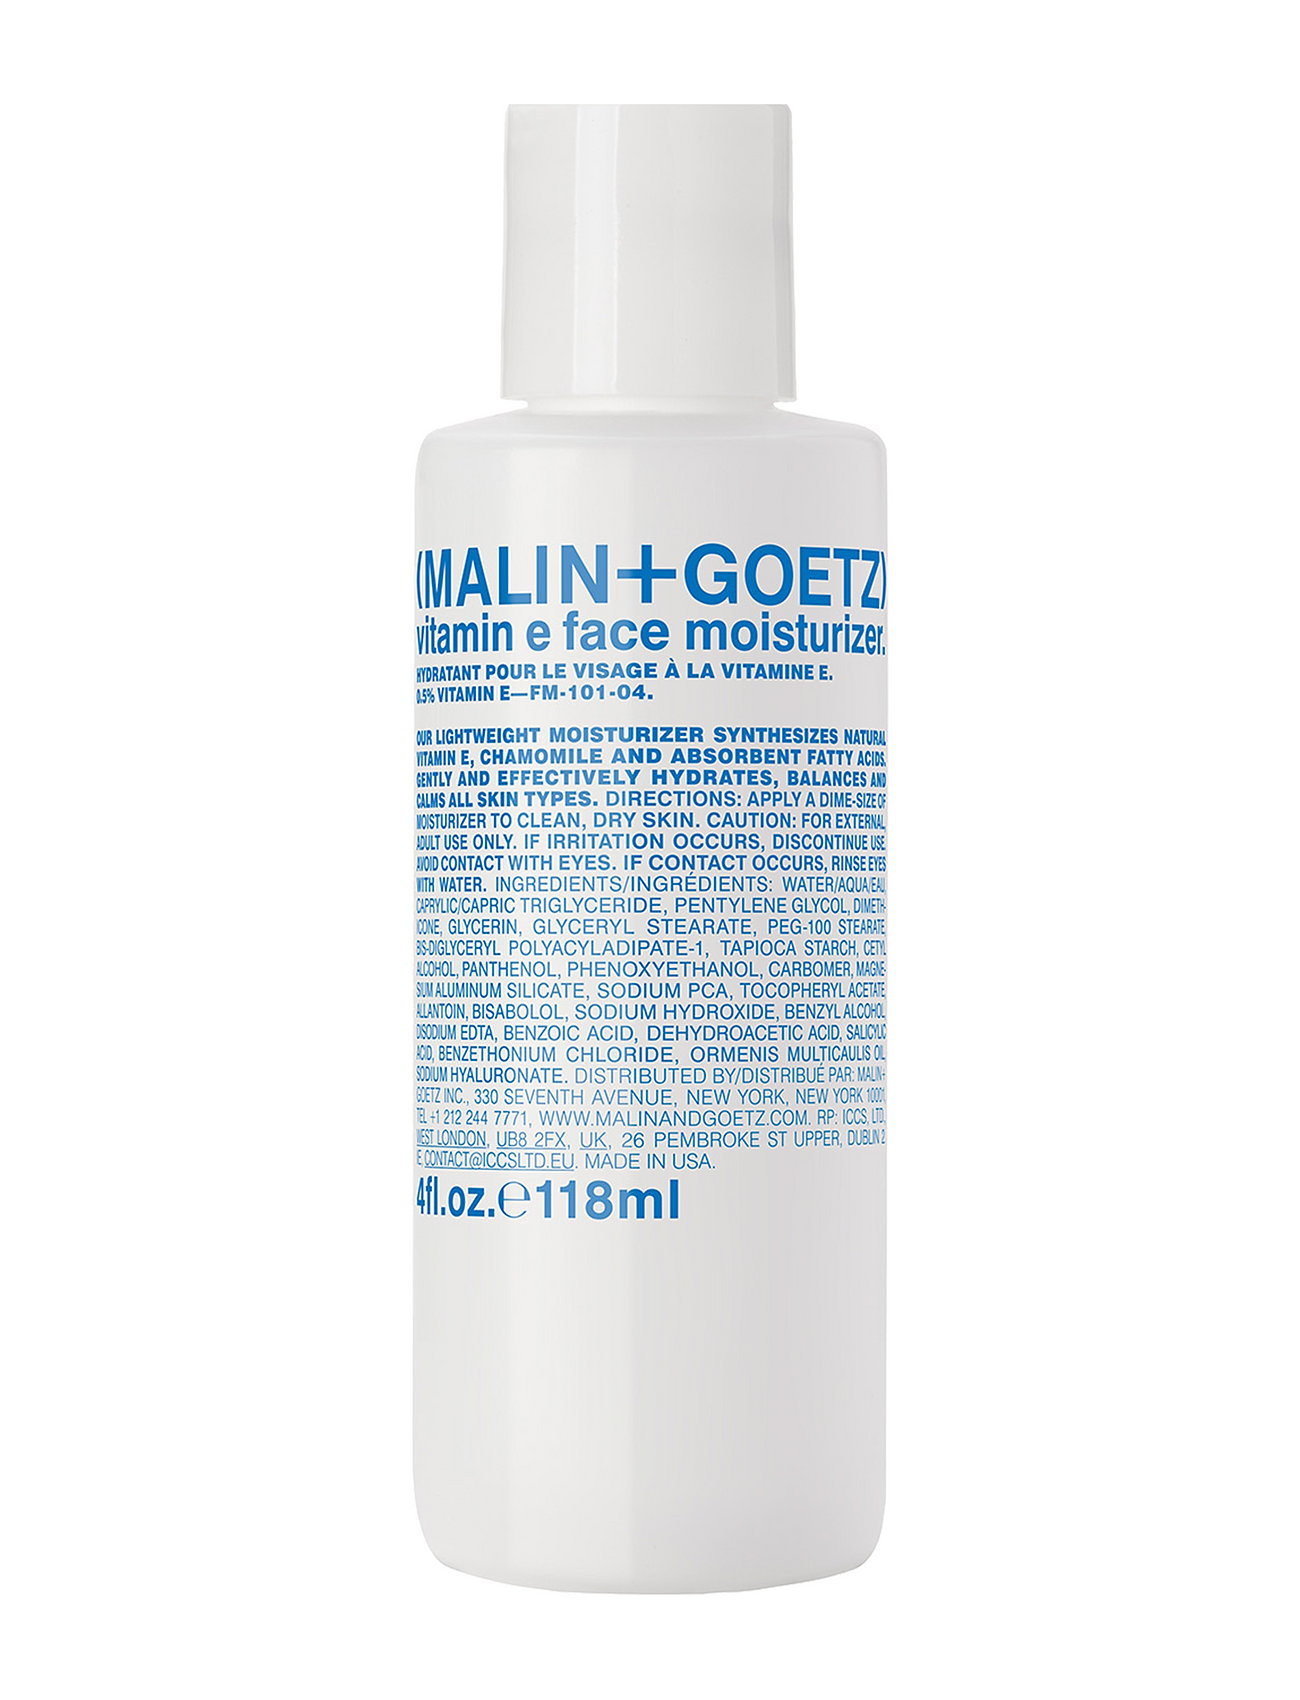 malin+goetz – Vitamin e face moisturizer fra boozt.com dk